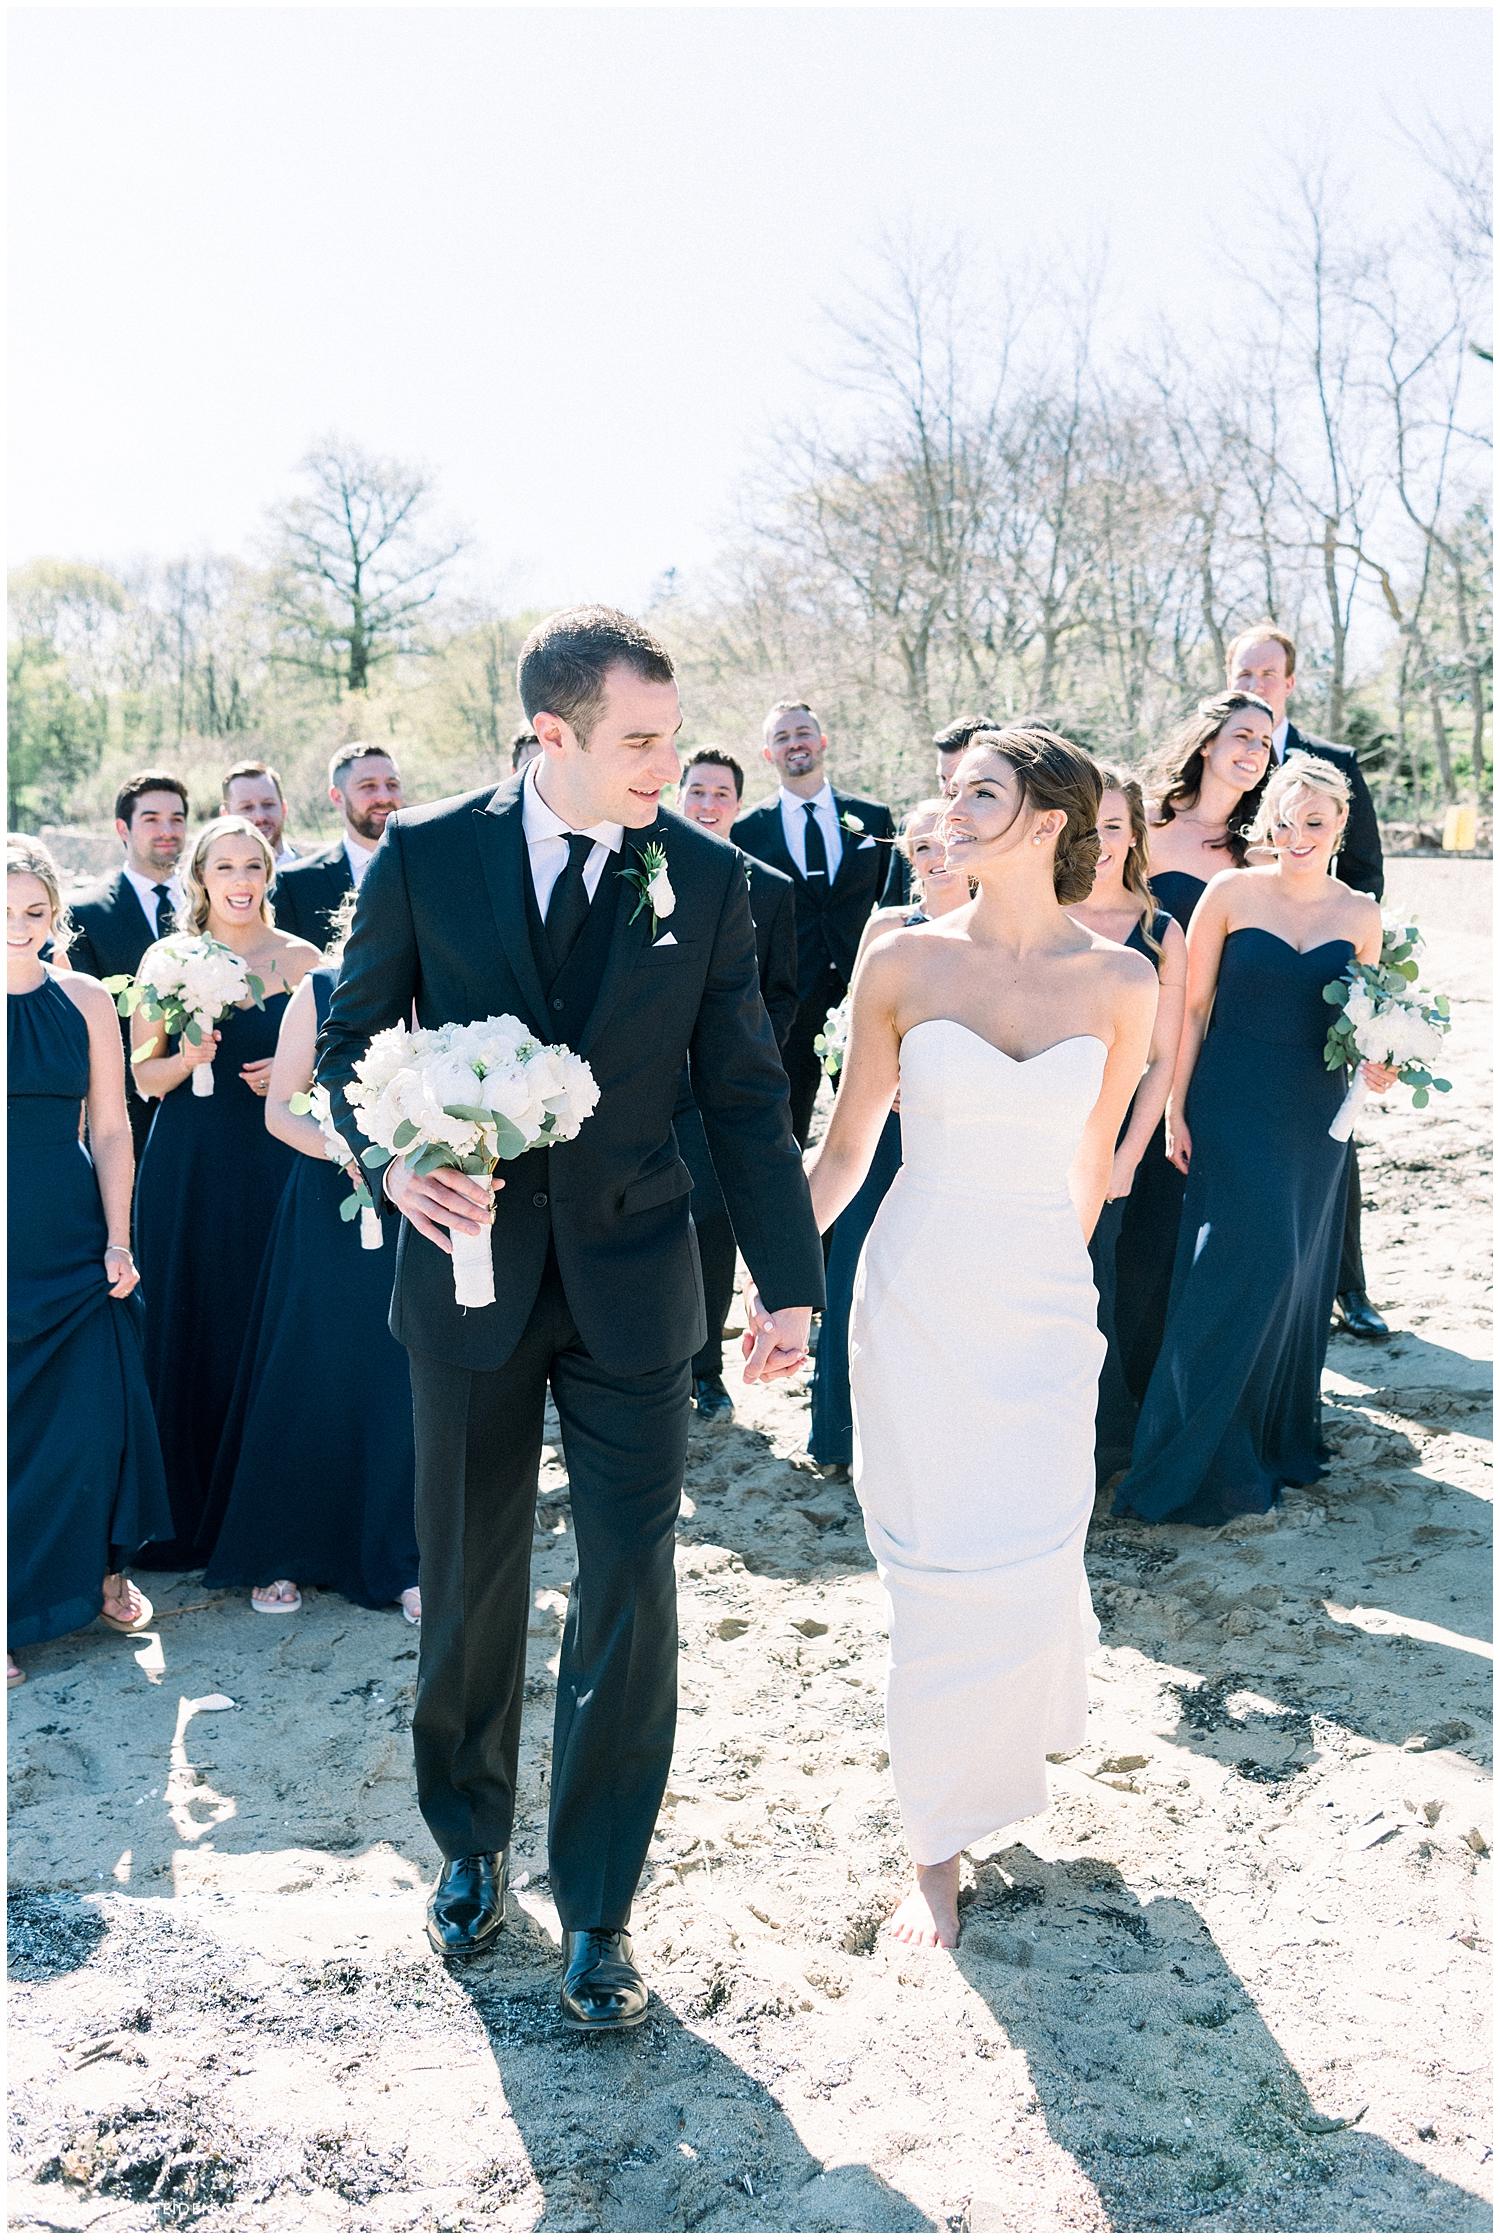 Jessica K Feiden Photography_Tupper Manor Beverly Wedding Photographer_0020.jpg